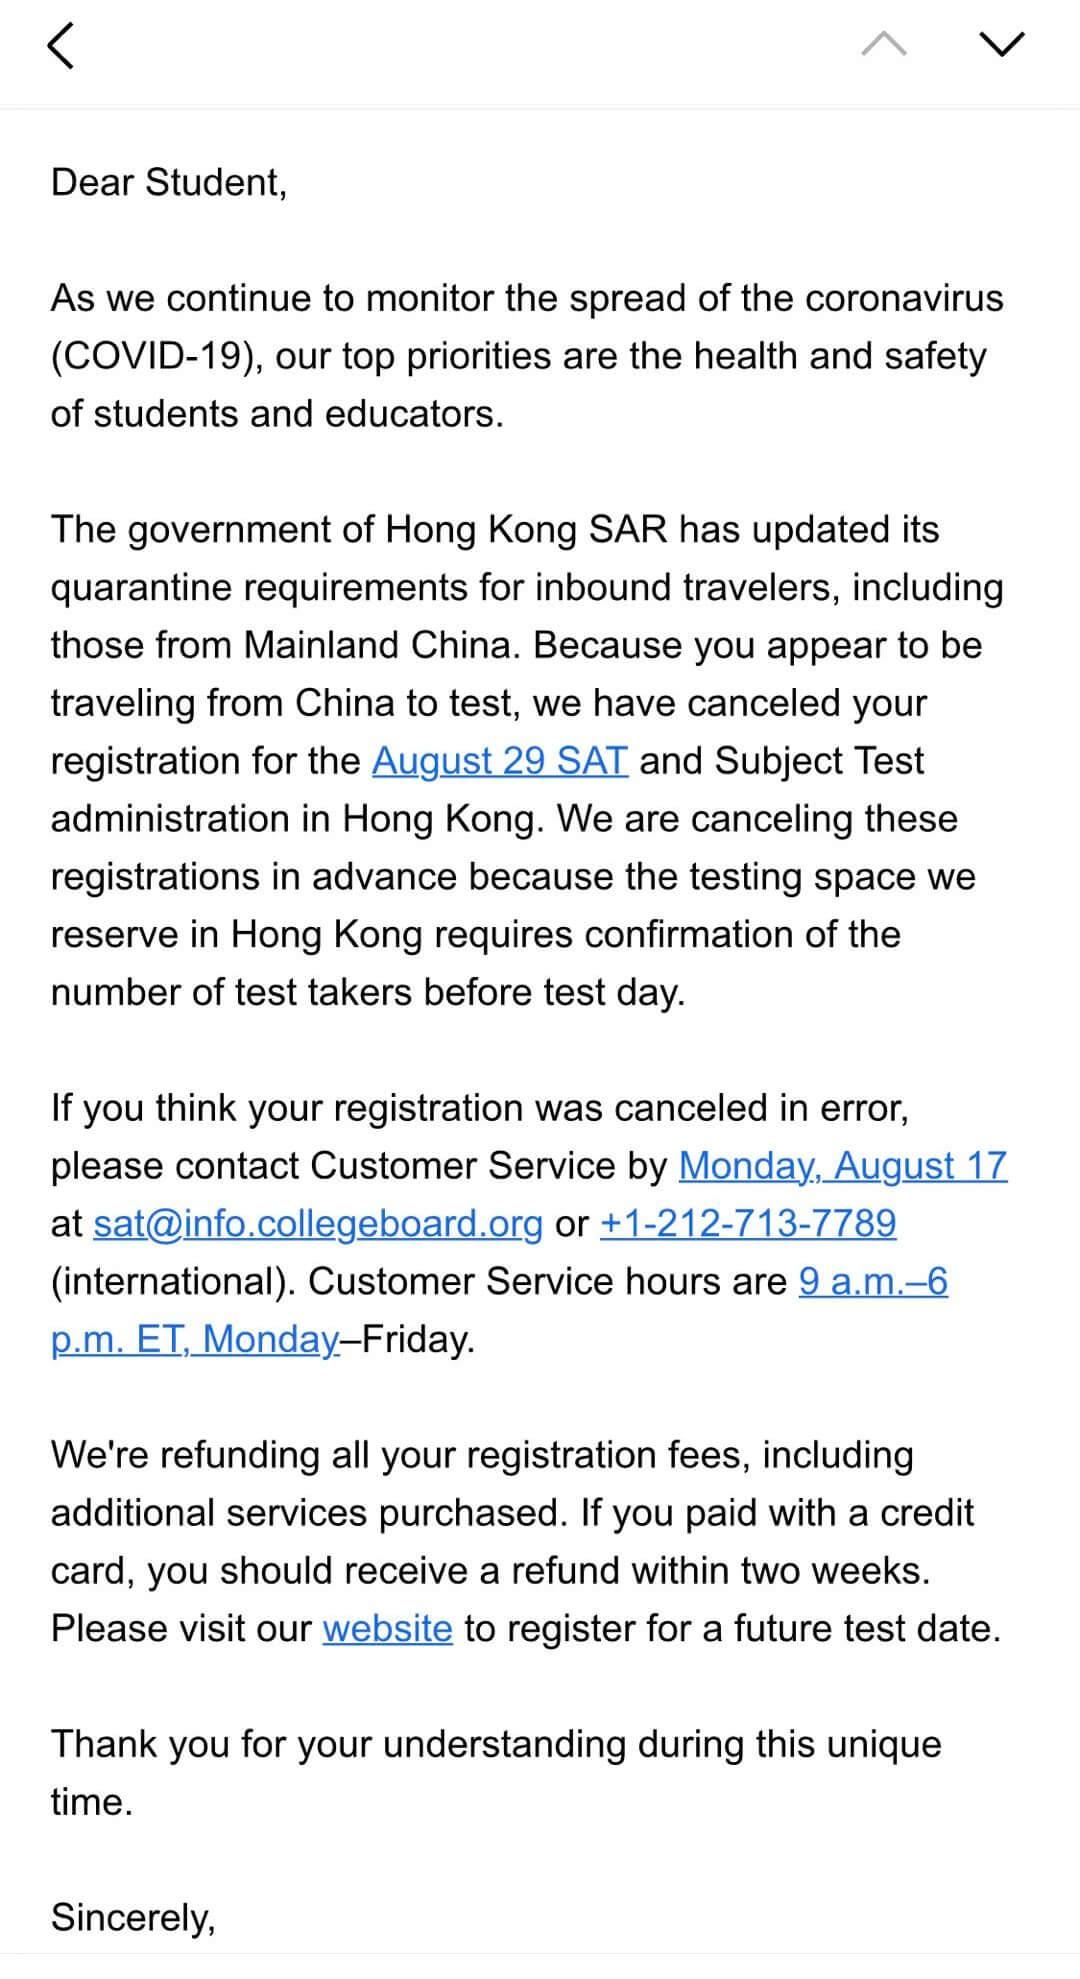 CB宣布取消2020年8月香港SAT考试,大陆赴香港8月SAT考试的考生该何去何从?香港SAT考试取消有什么影响?